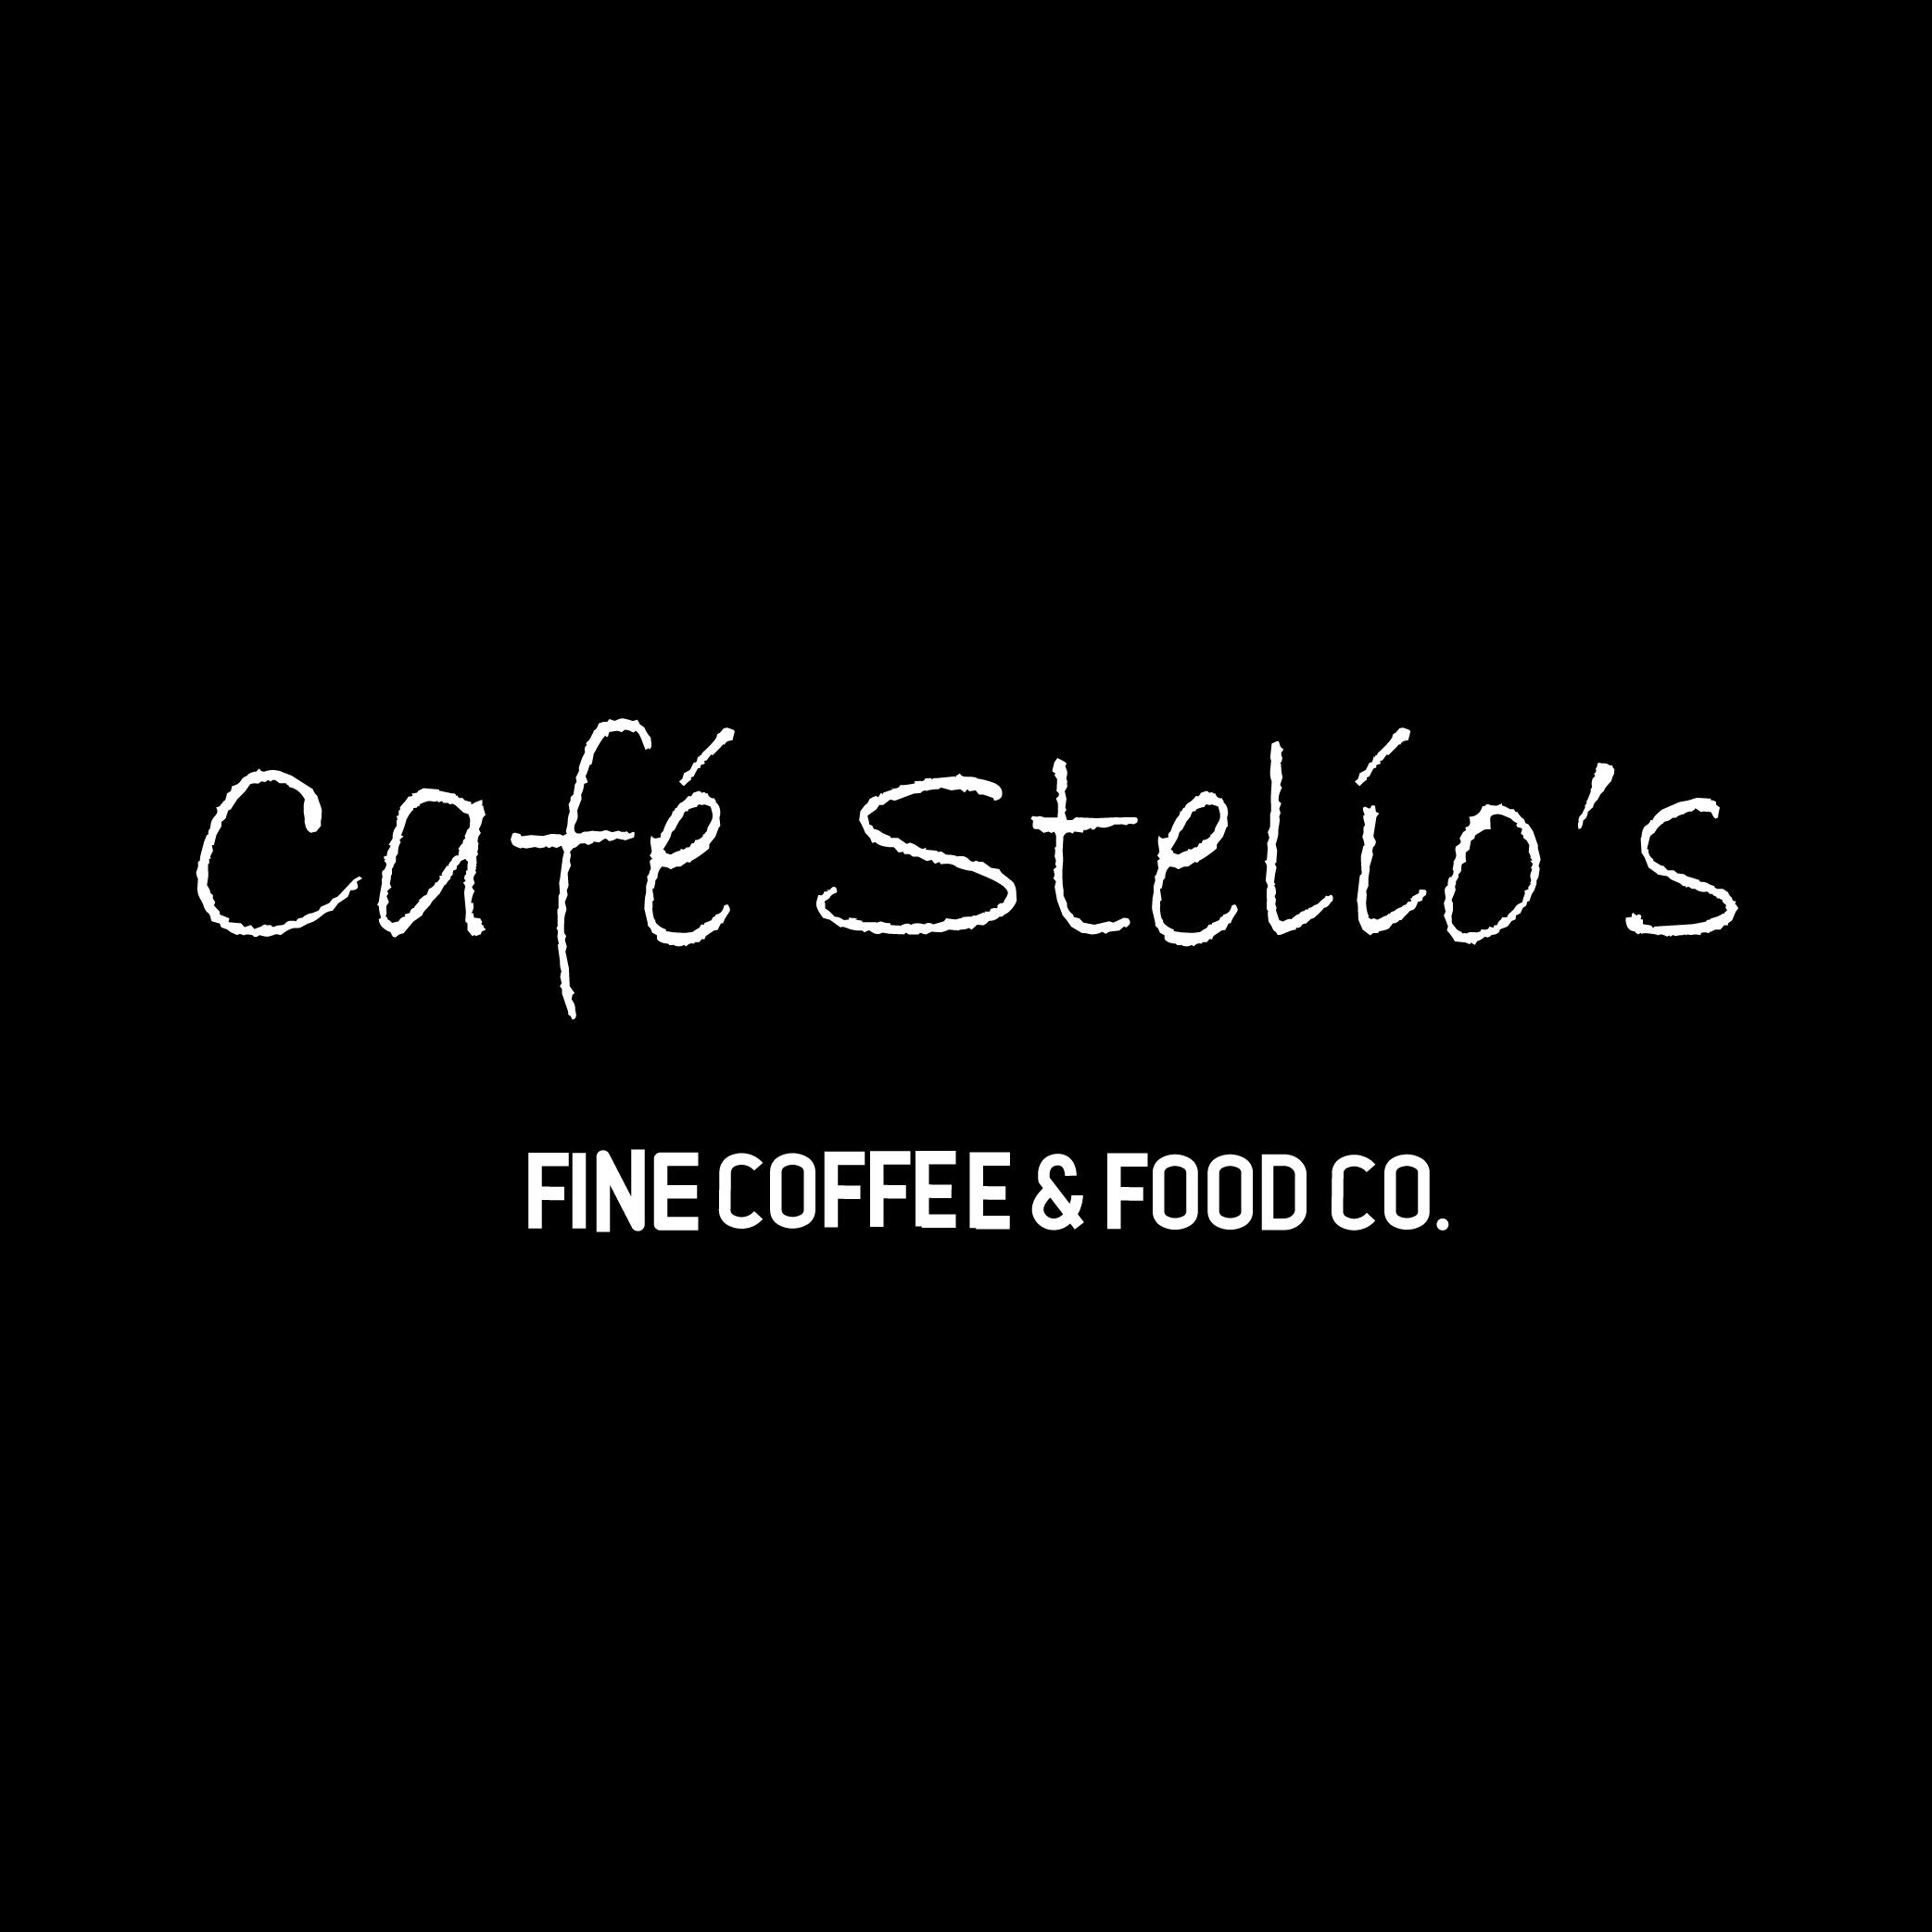 Cafe Stelios